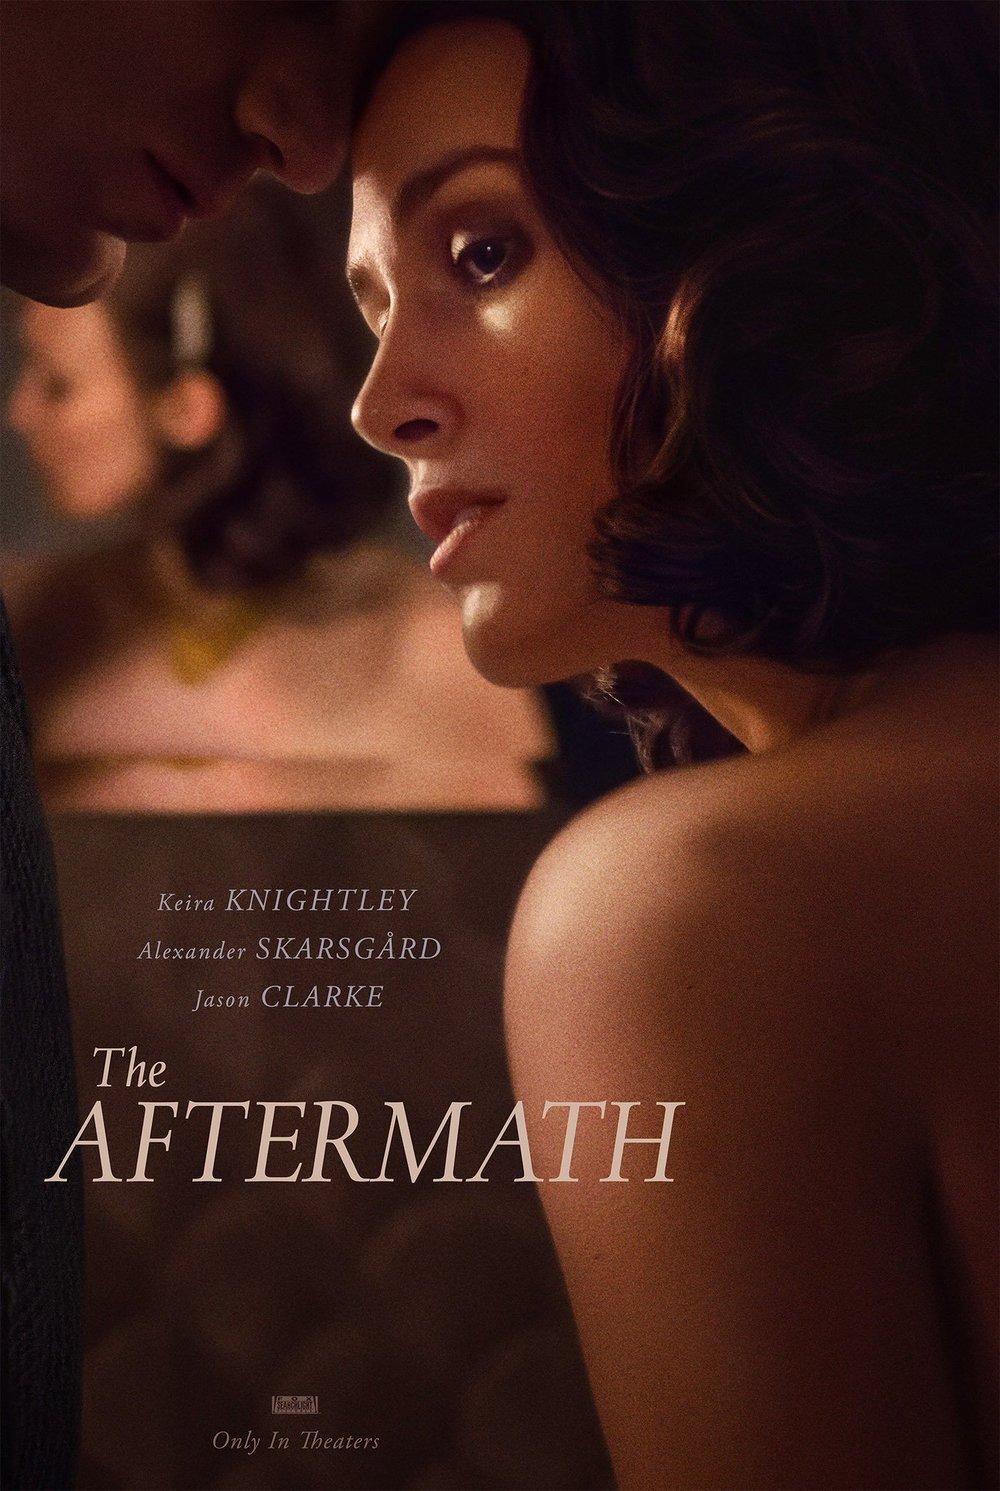 @AftermathMovie